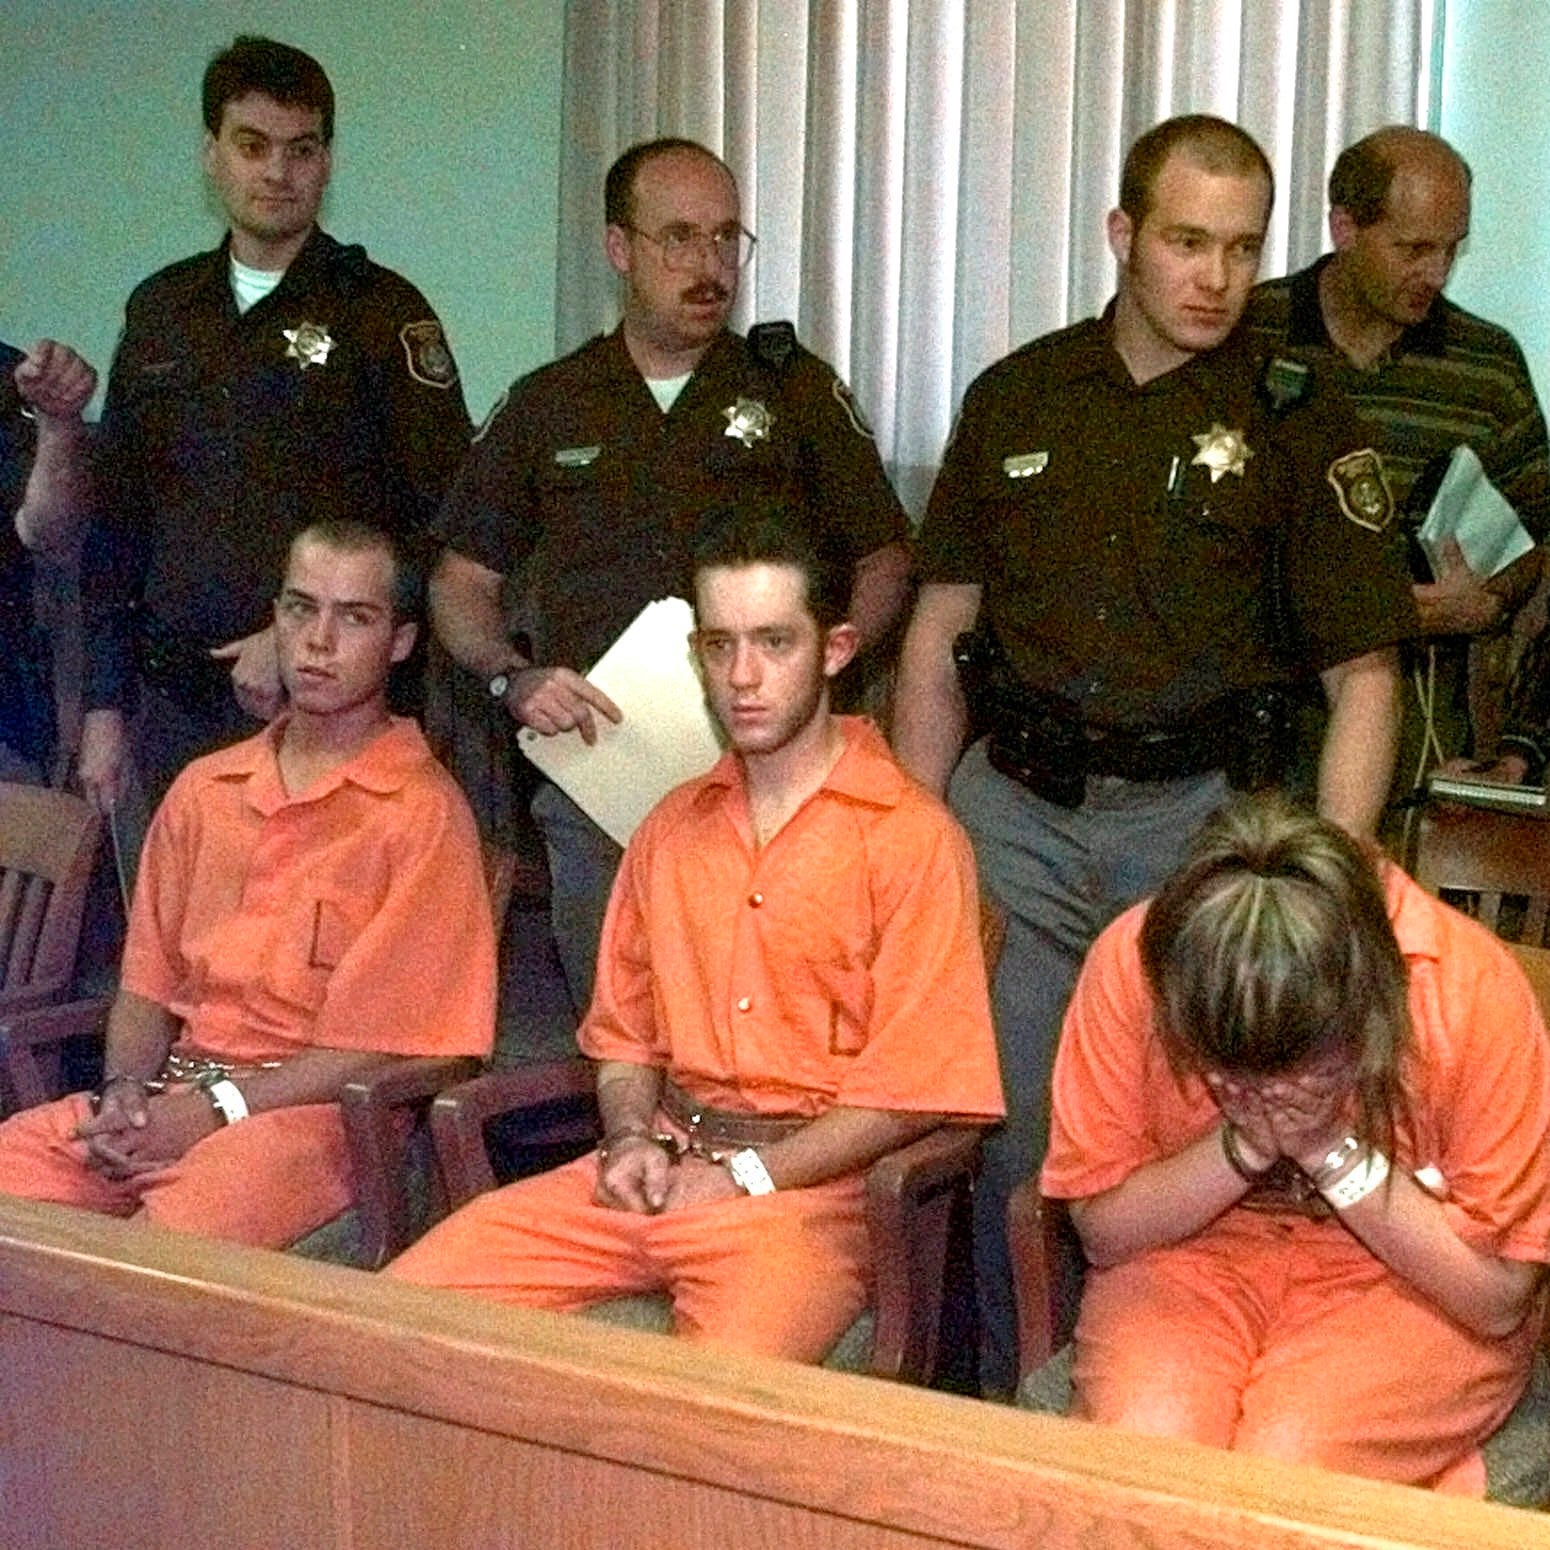 Letter from Matthew Shepard's killer: 'Blame everything on me'